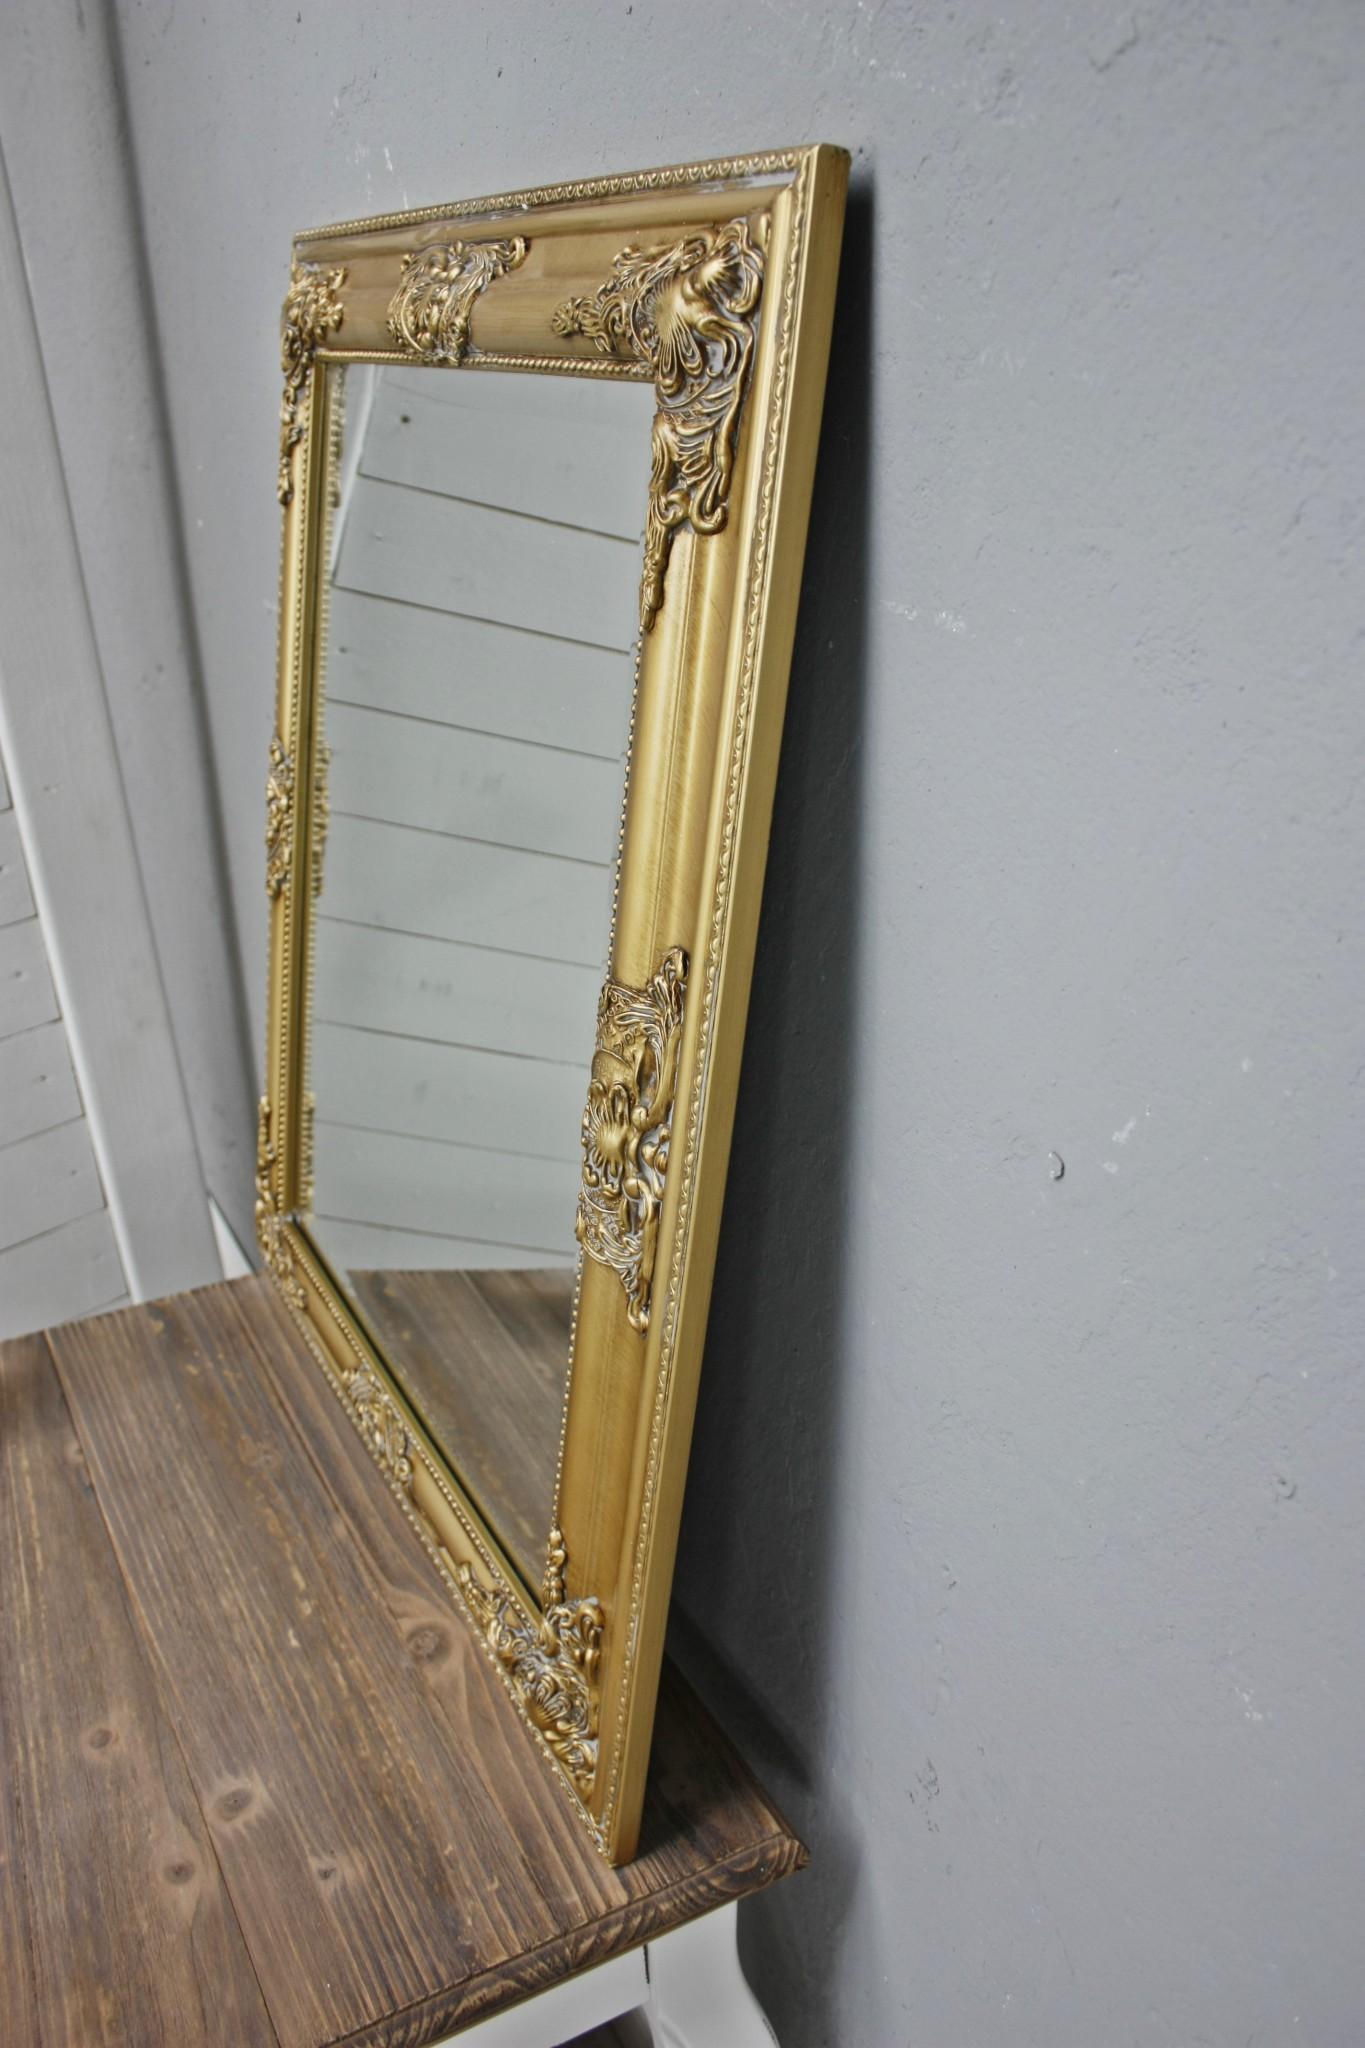 spiegel 62x52 cm wandspiegel barock gold holz landhaus holzrahmen badspiegel ebay. Black Bedroom Furniture Sets. Home Design Ideas